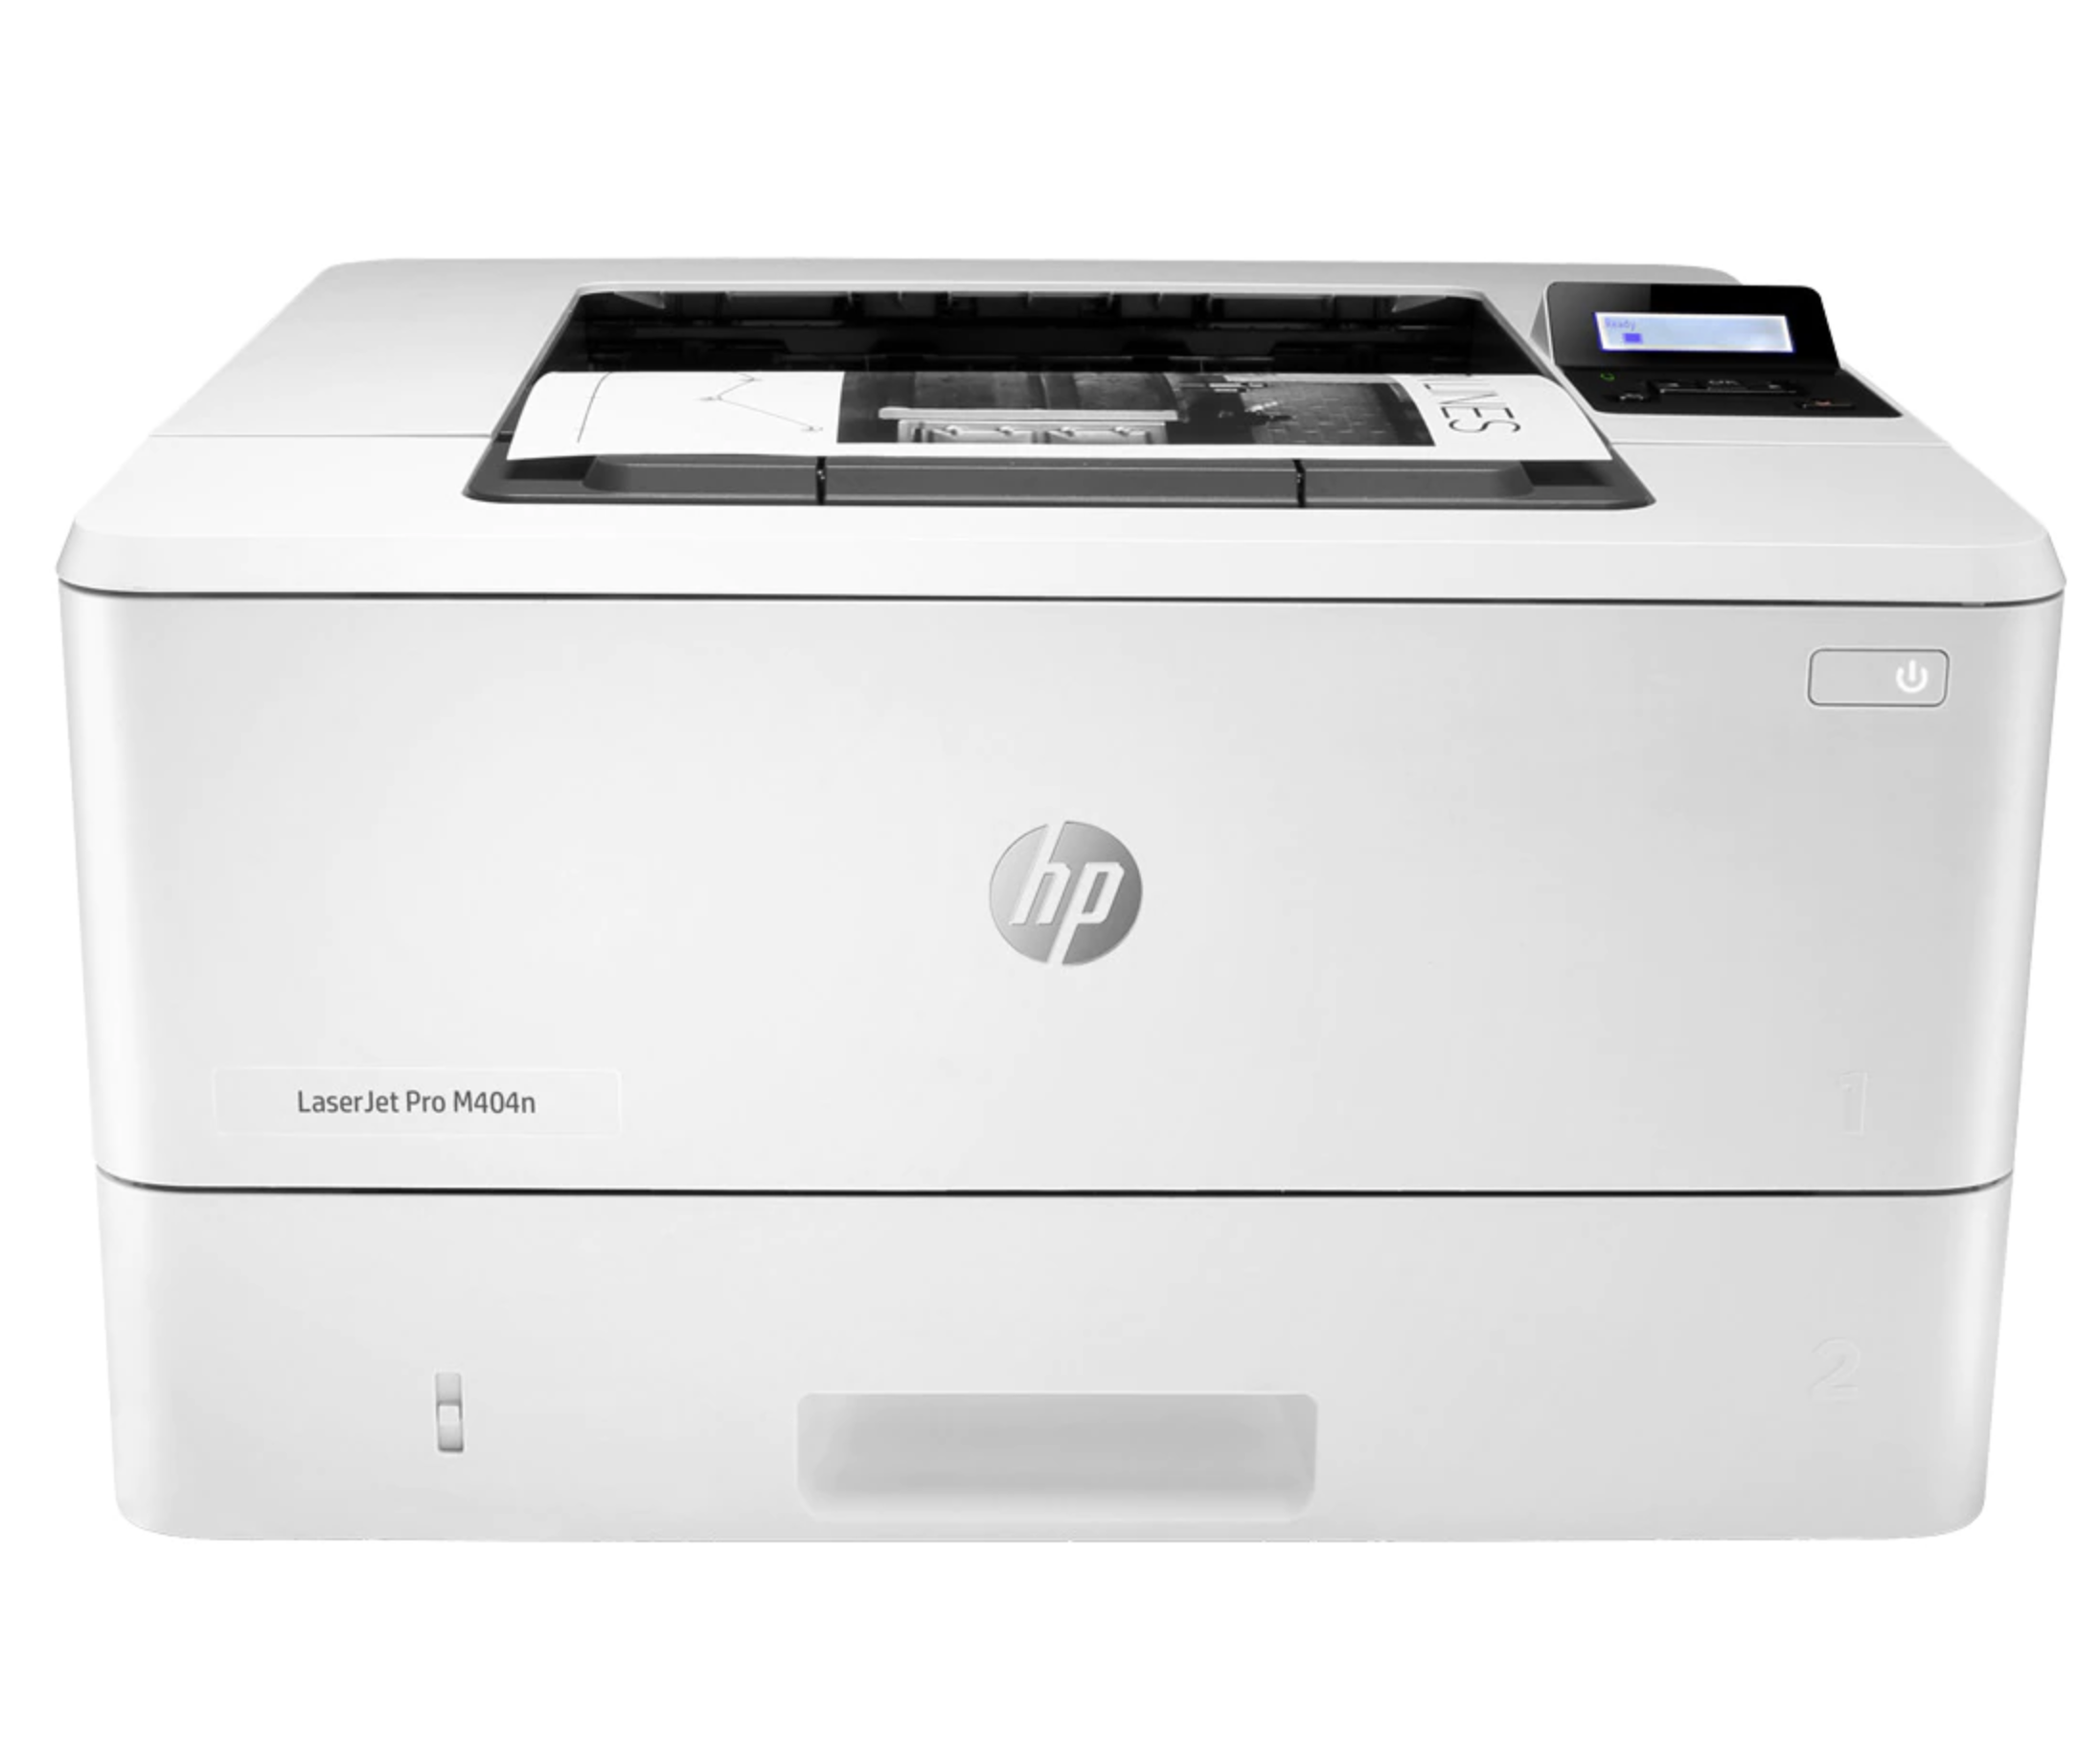 Impresora láser monocromo HP LaserJet Pro M404n